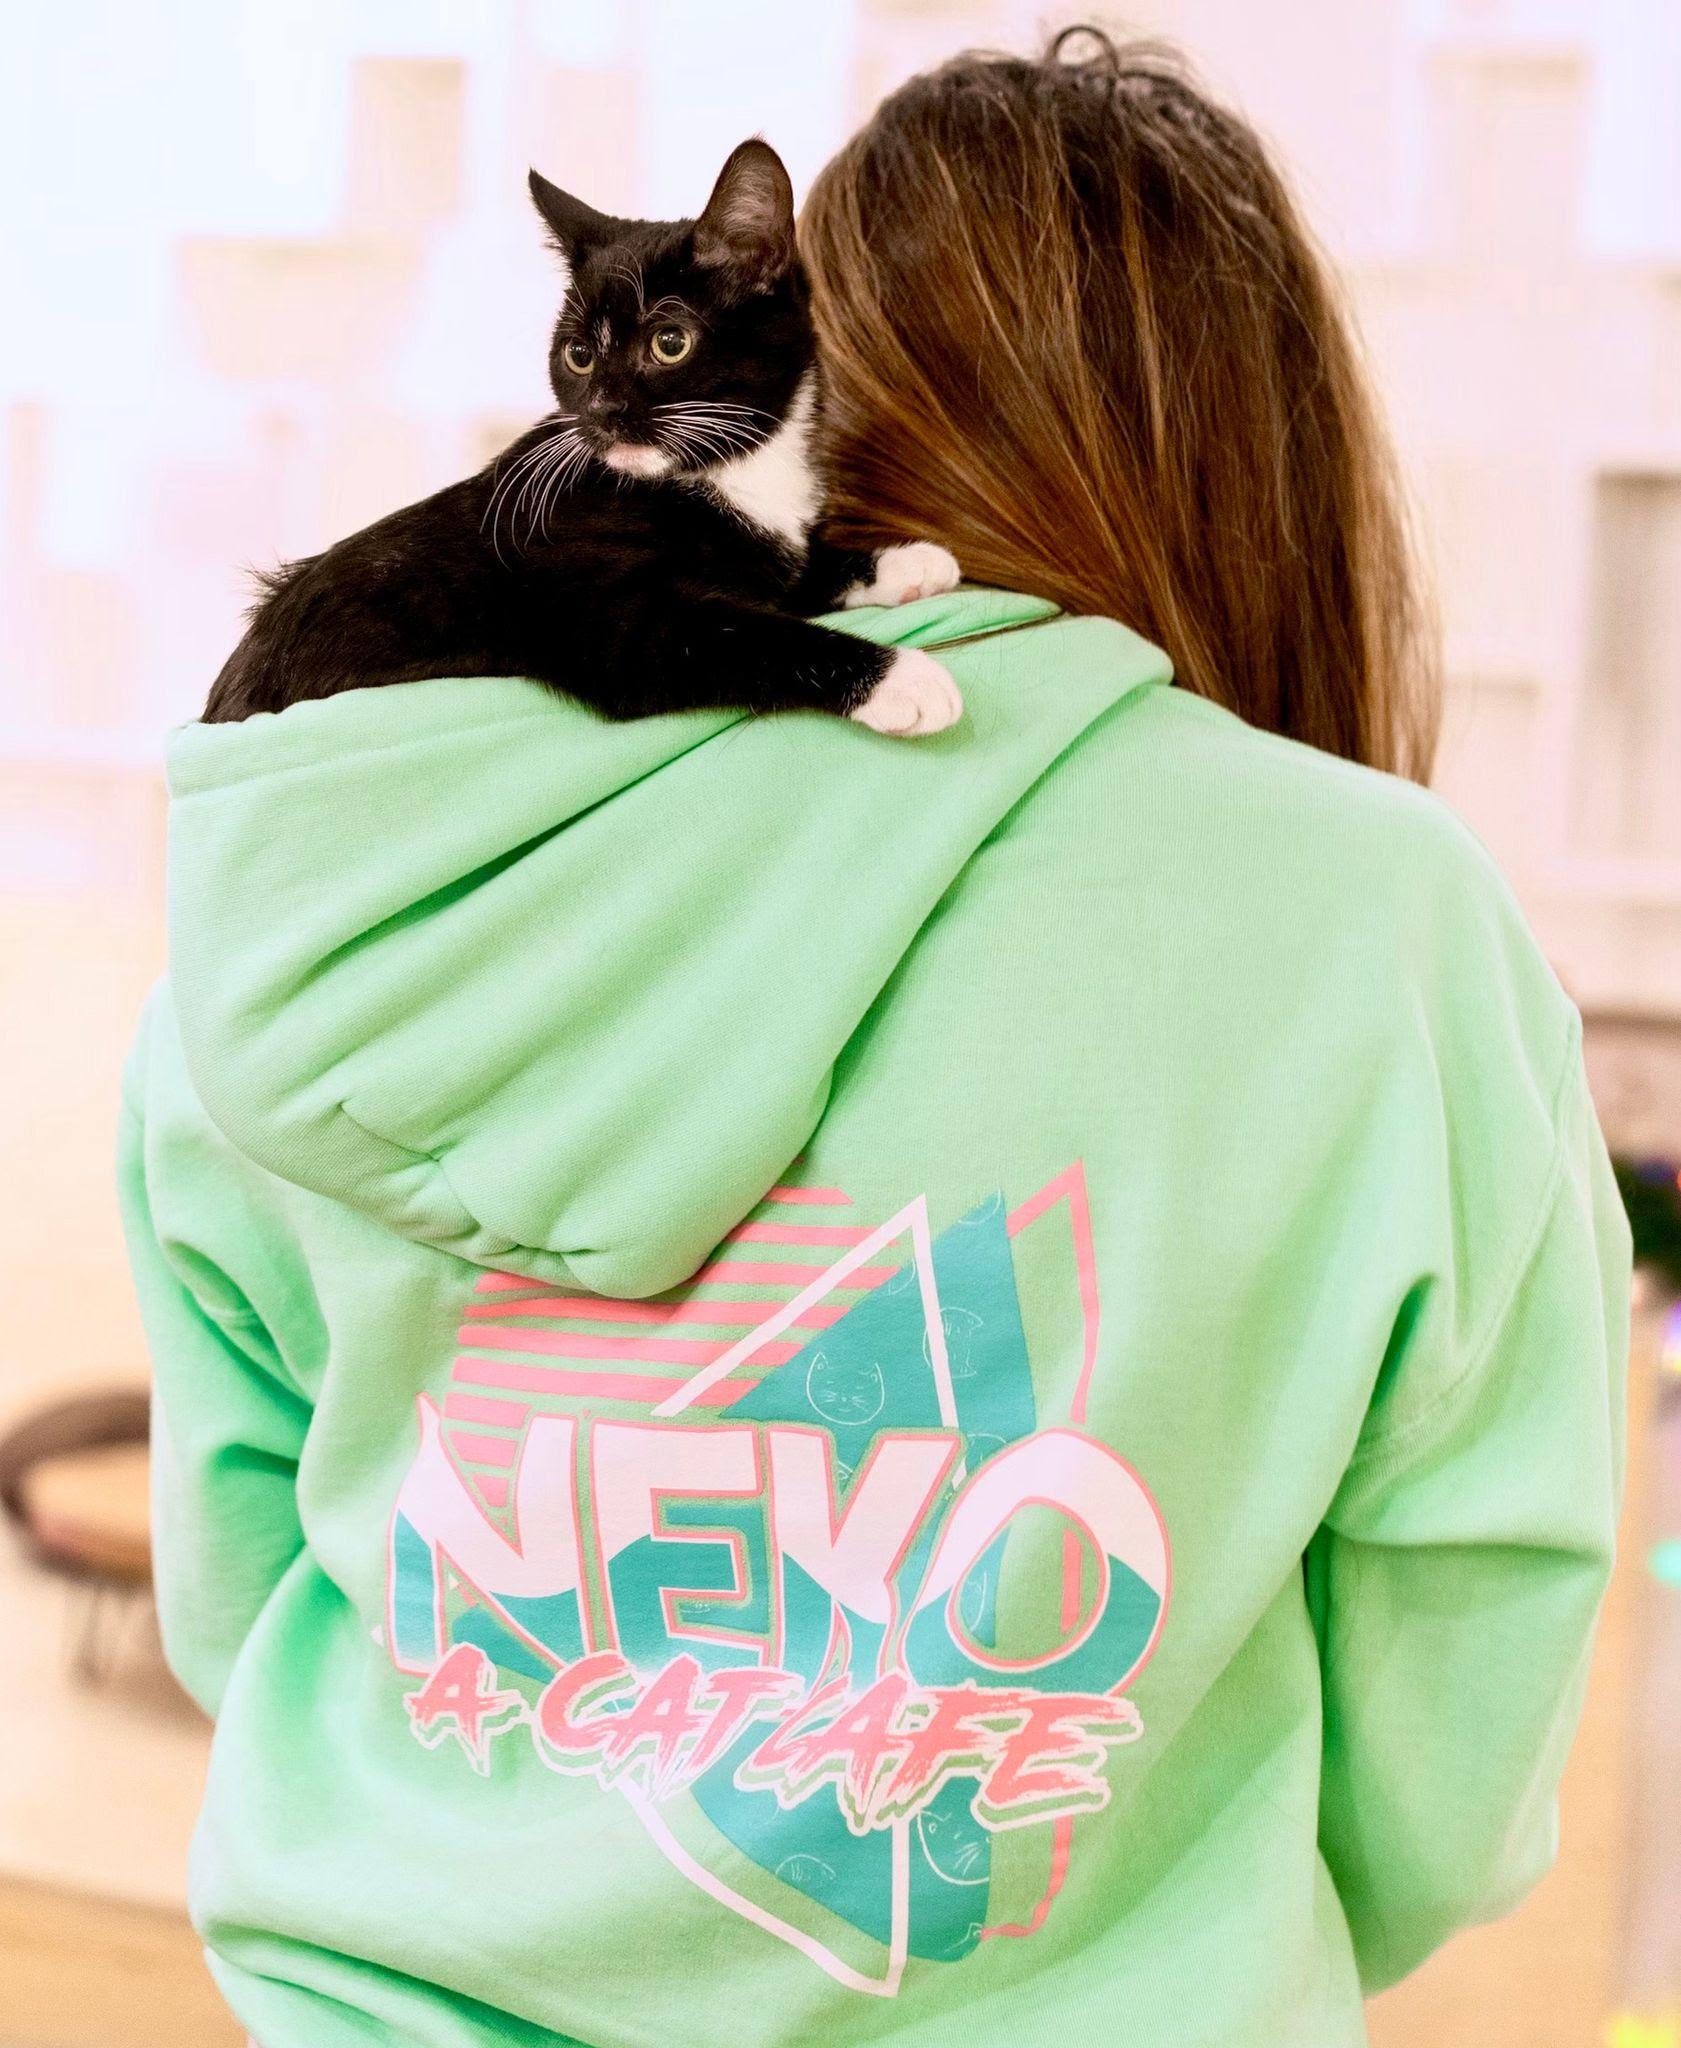 neko-blog-last-chance-insert